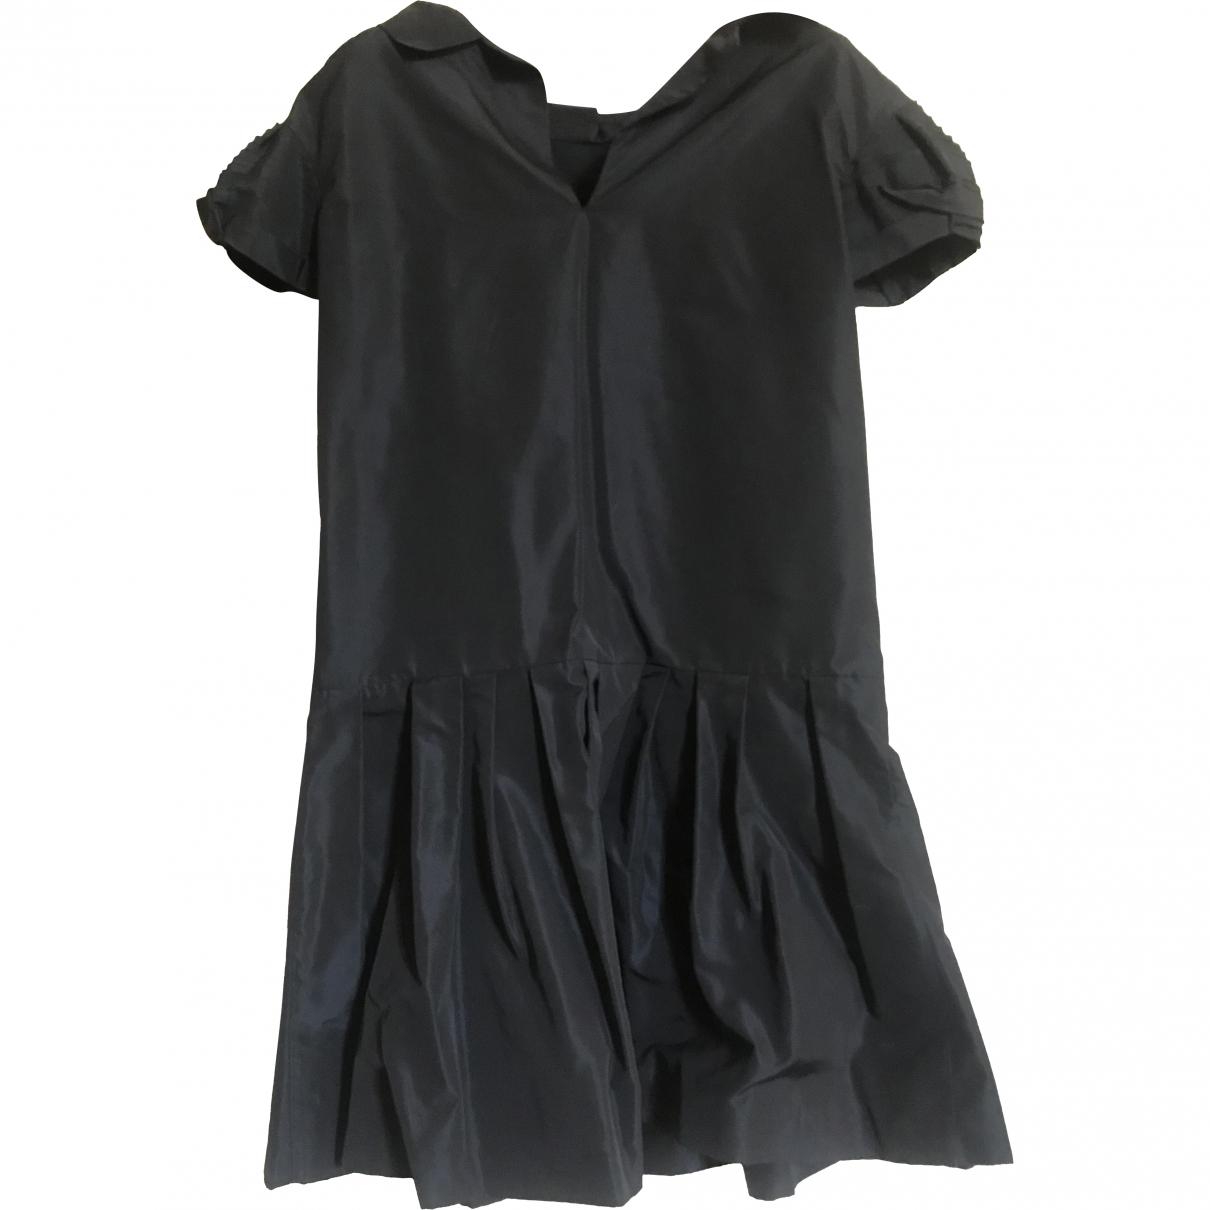 Miu Miu \N Navy dress for Women 40 IT